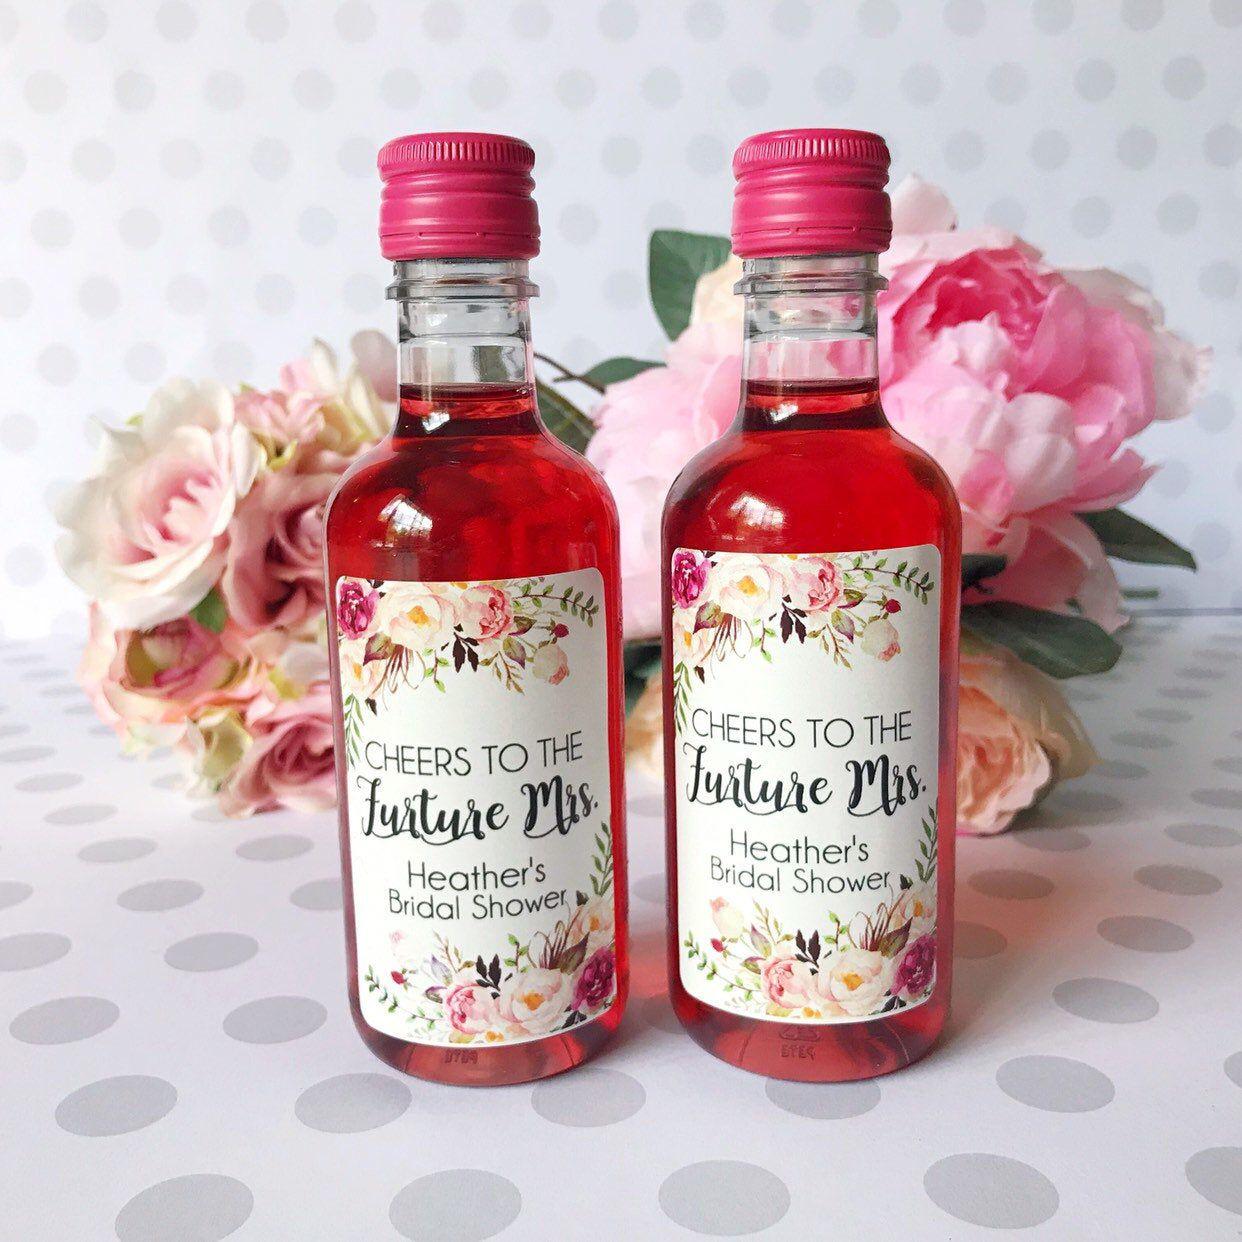 Custom Bachelorette Party Favors Mini Wine Bottle Labels Bridal Shower Favors Custom Wine Labels In 2020 Mini Wine Bottle Favors Mini Wine Bottles Wine Bottle Labels